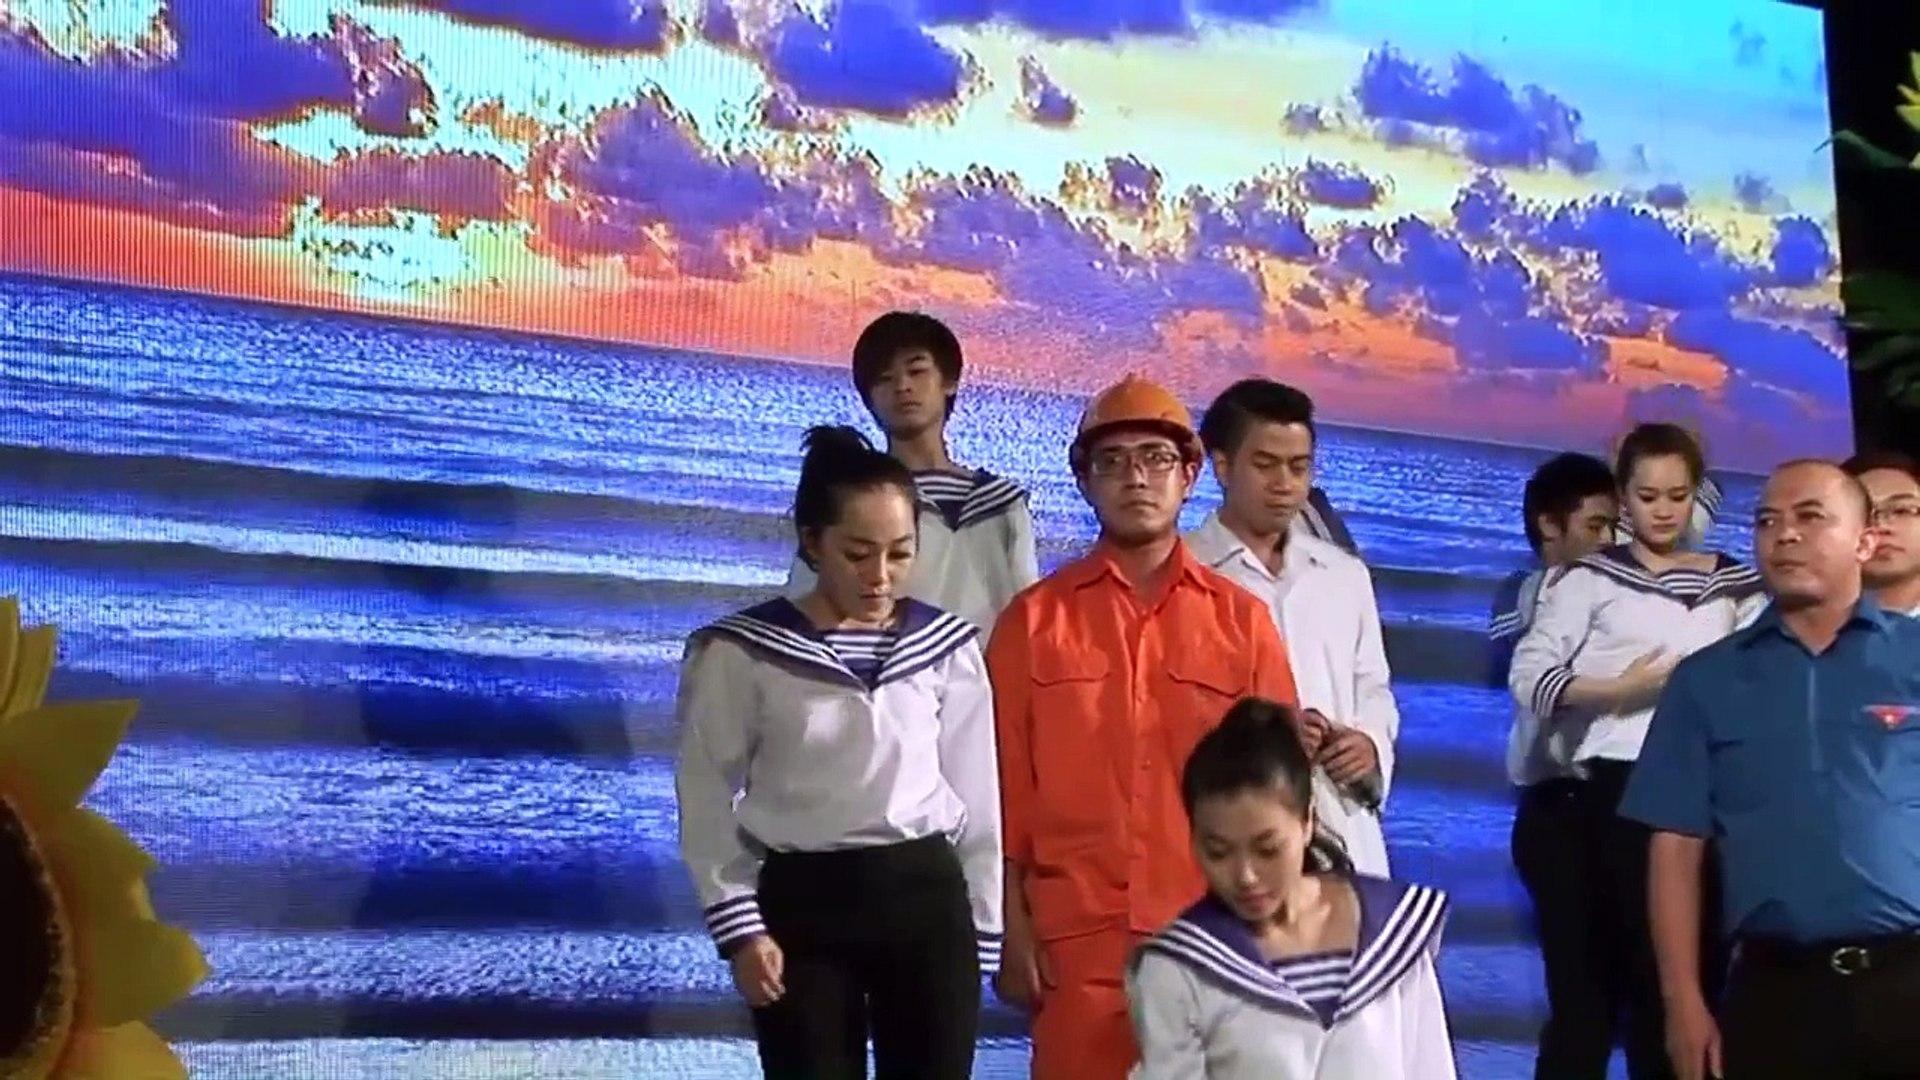 Thuong lam dao xa- sang tac Thanh Binh - top ca VCB HCM